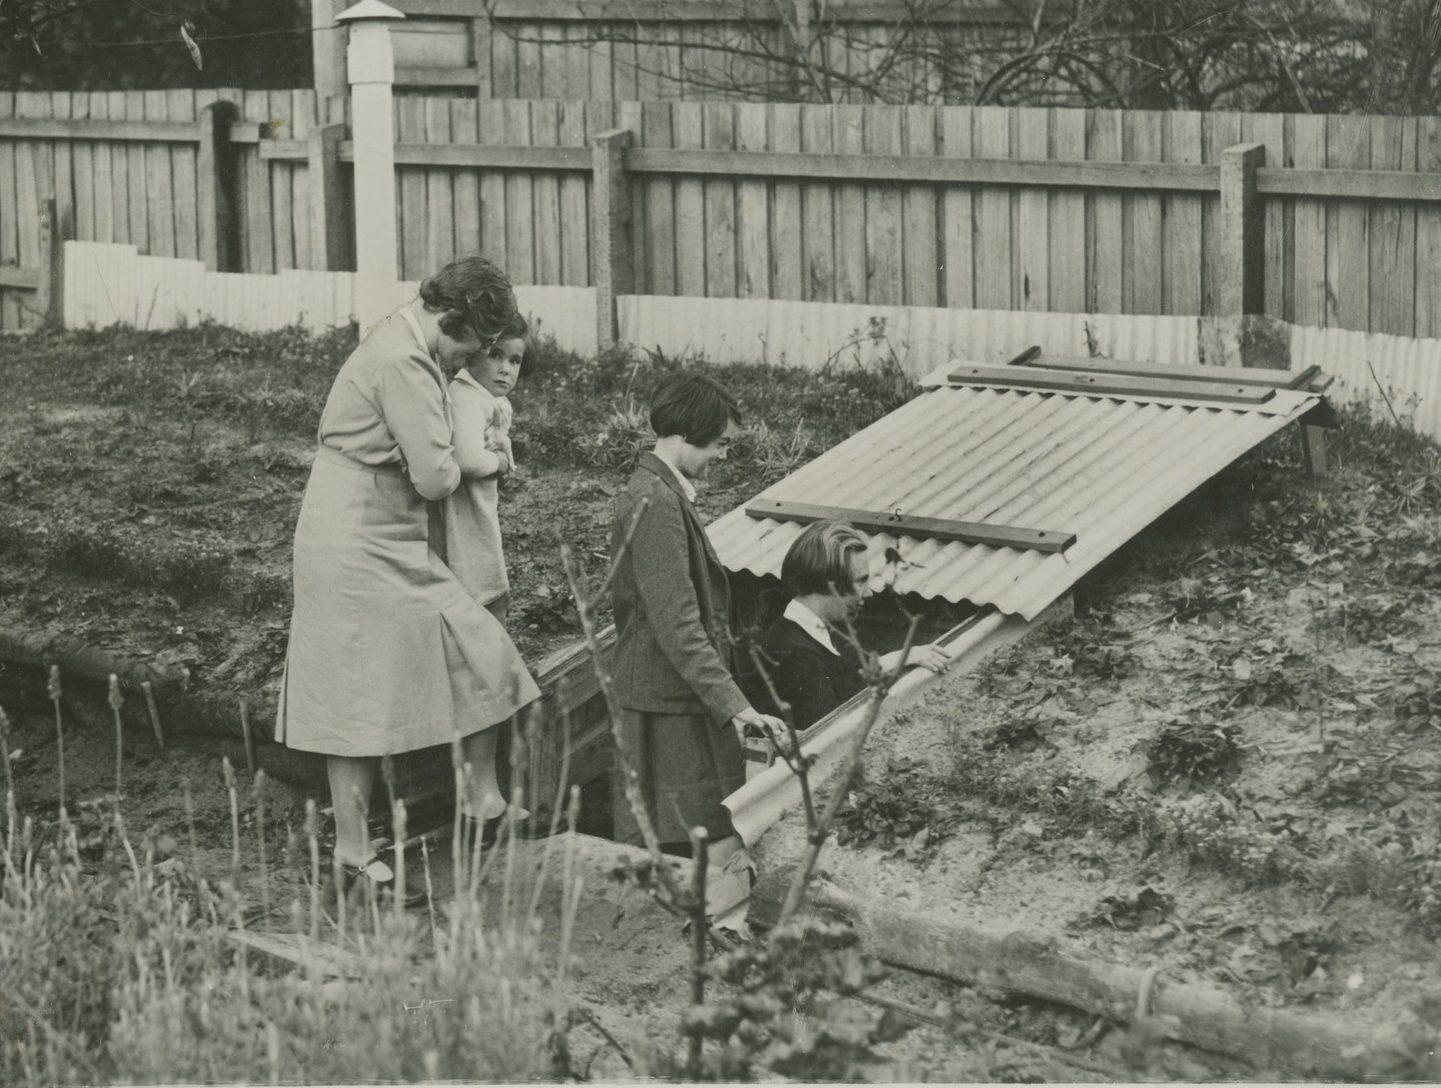 Shows family of women entering backyard air-raid shelter.